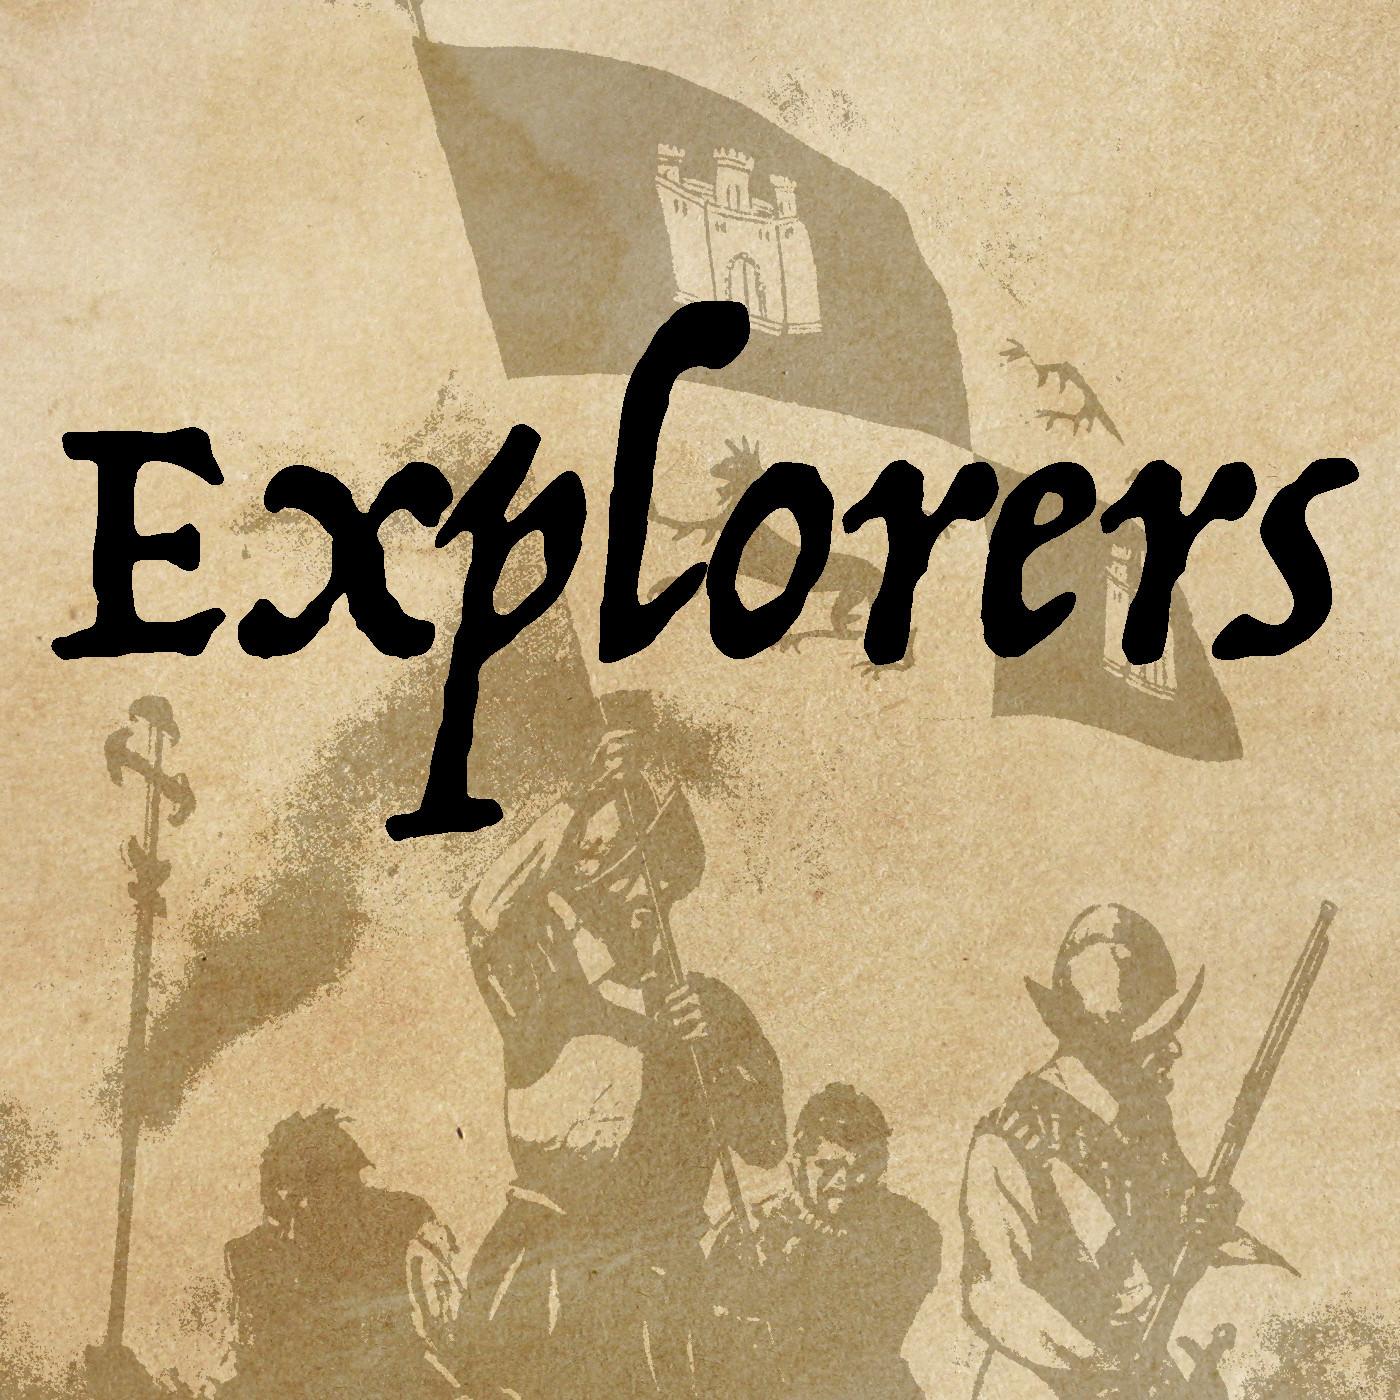 Ferdinand Magellan and the Circumnavigation of the World - Part 1